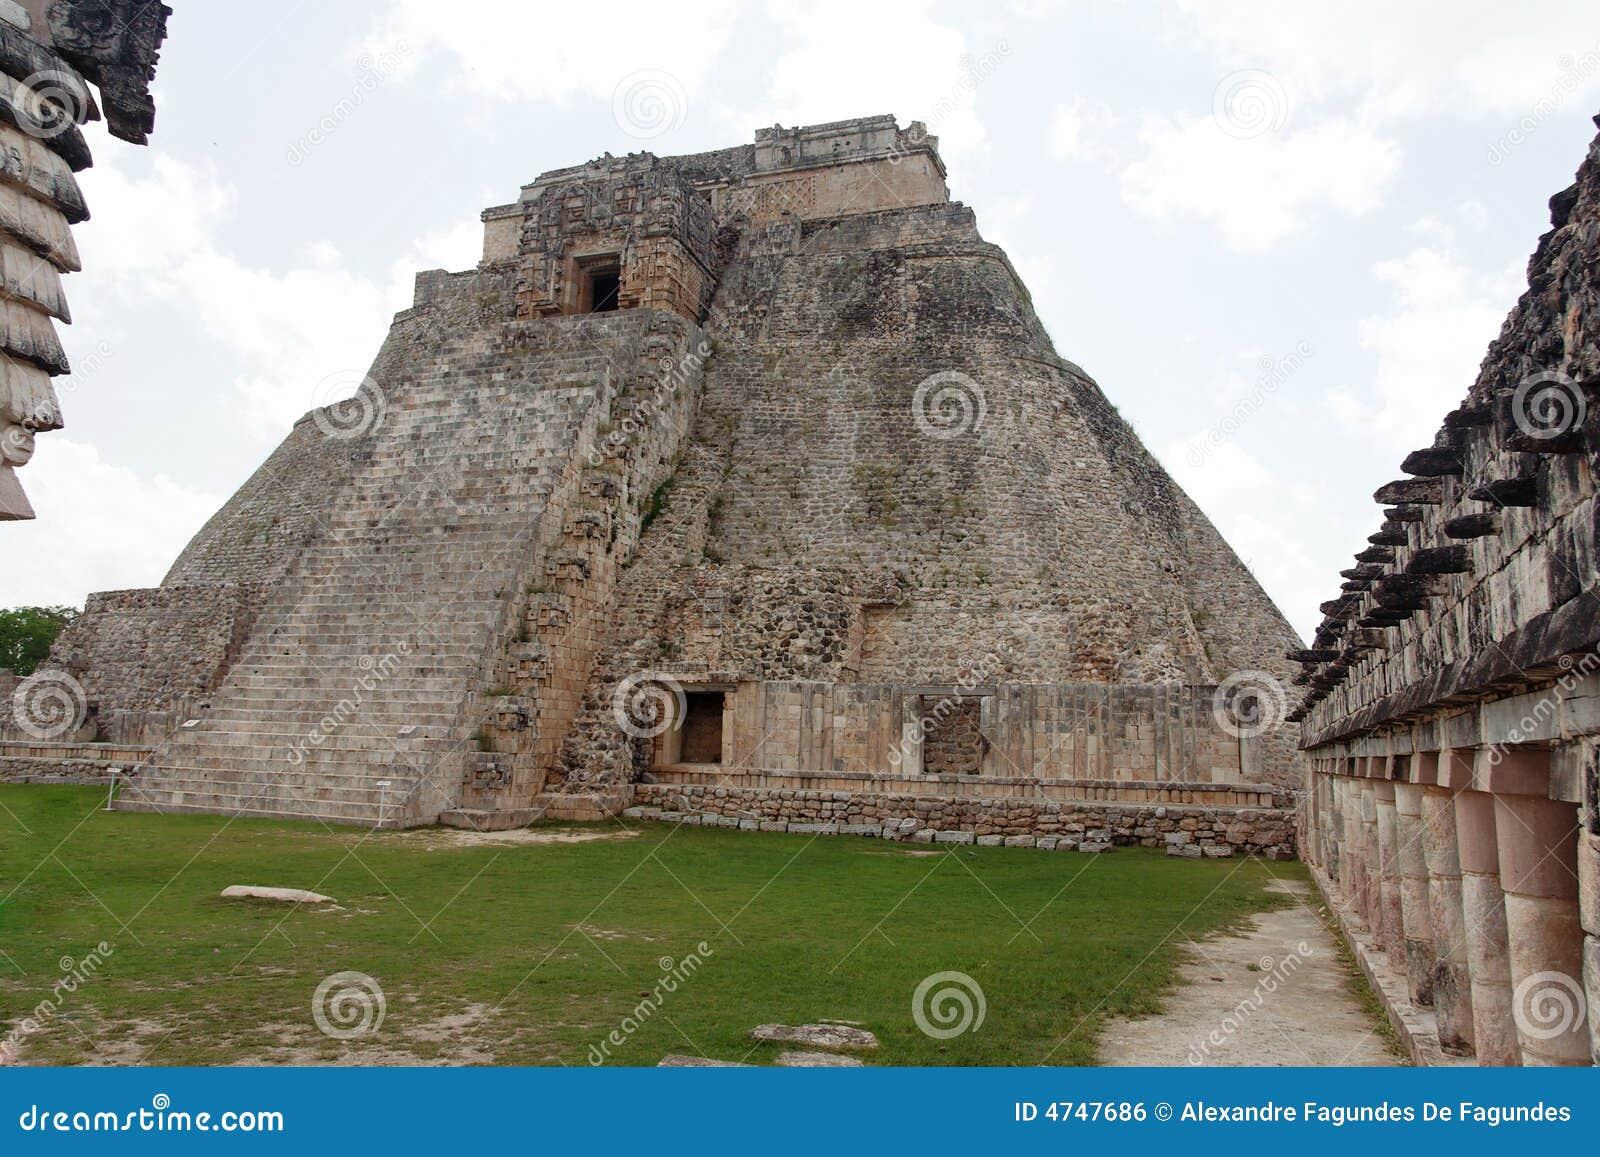 Trollkarlmexico pyramid uxmal yucatan